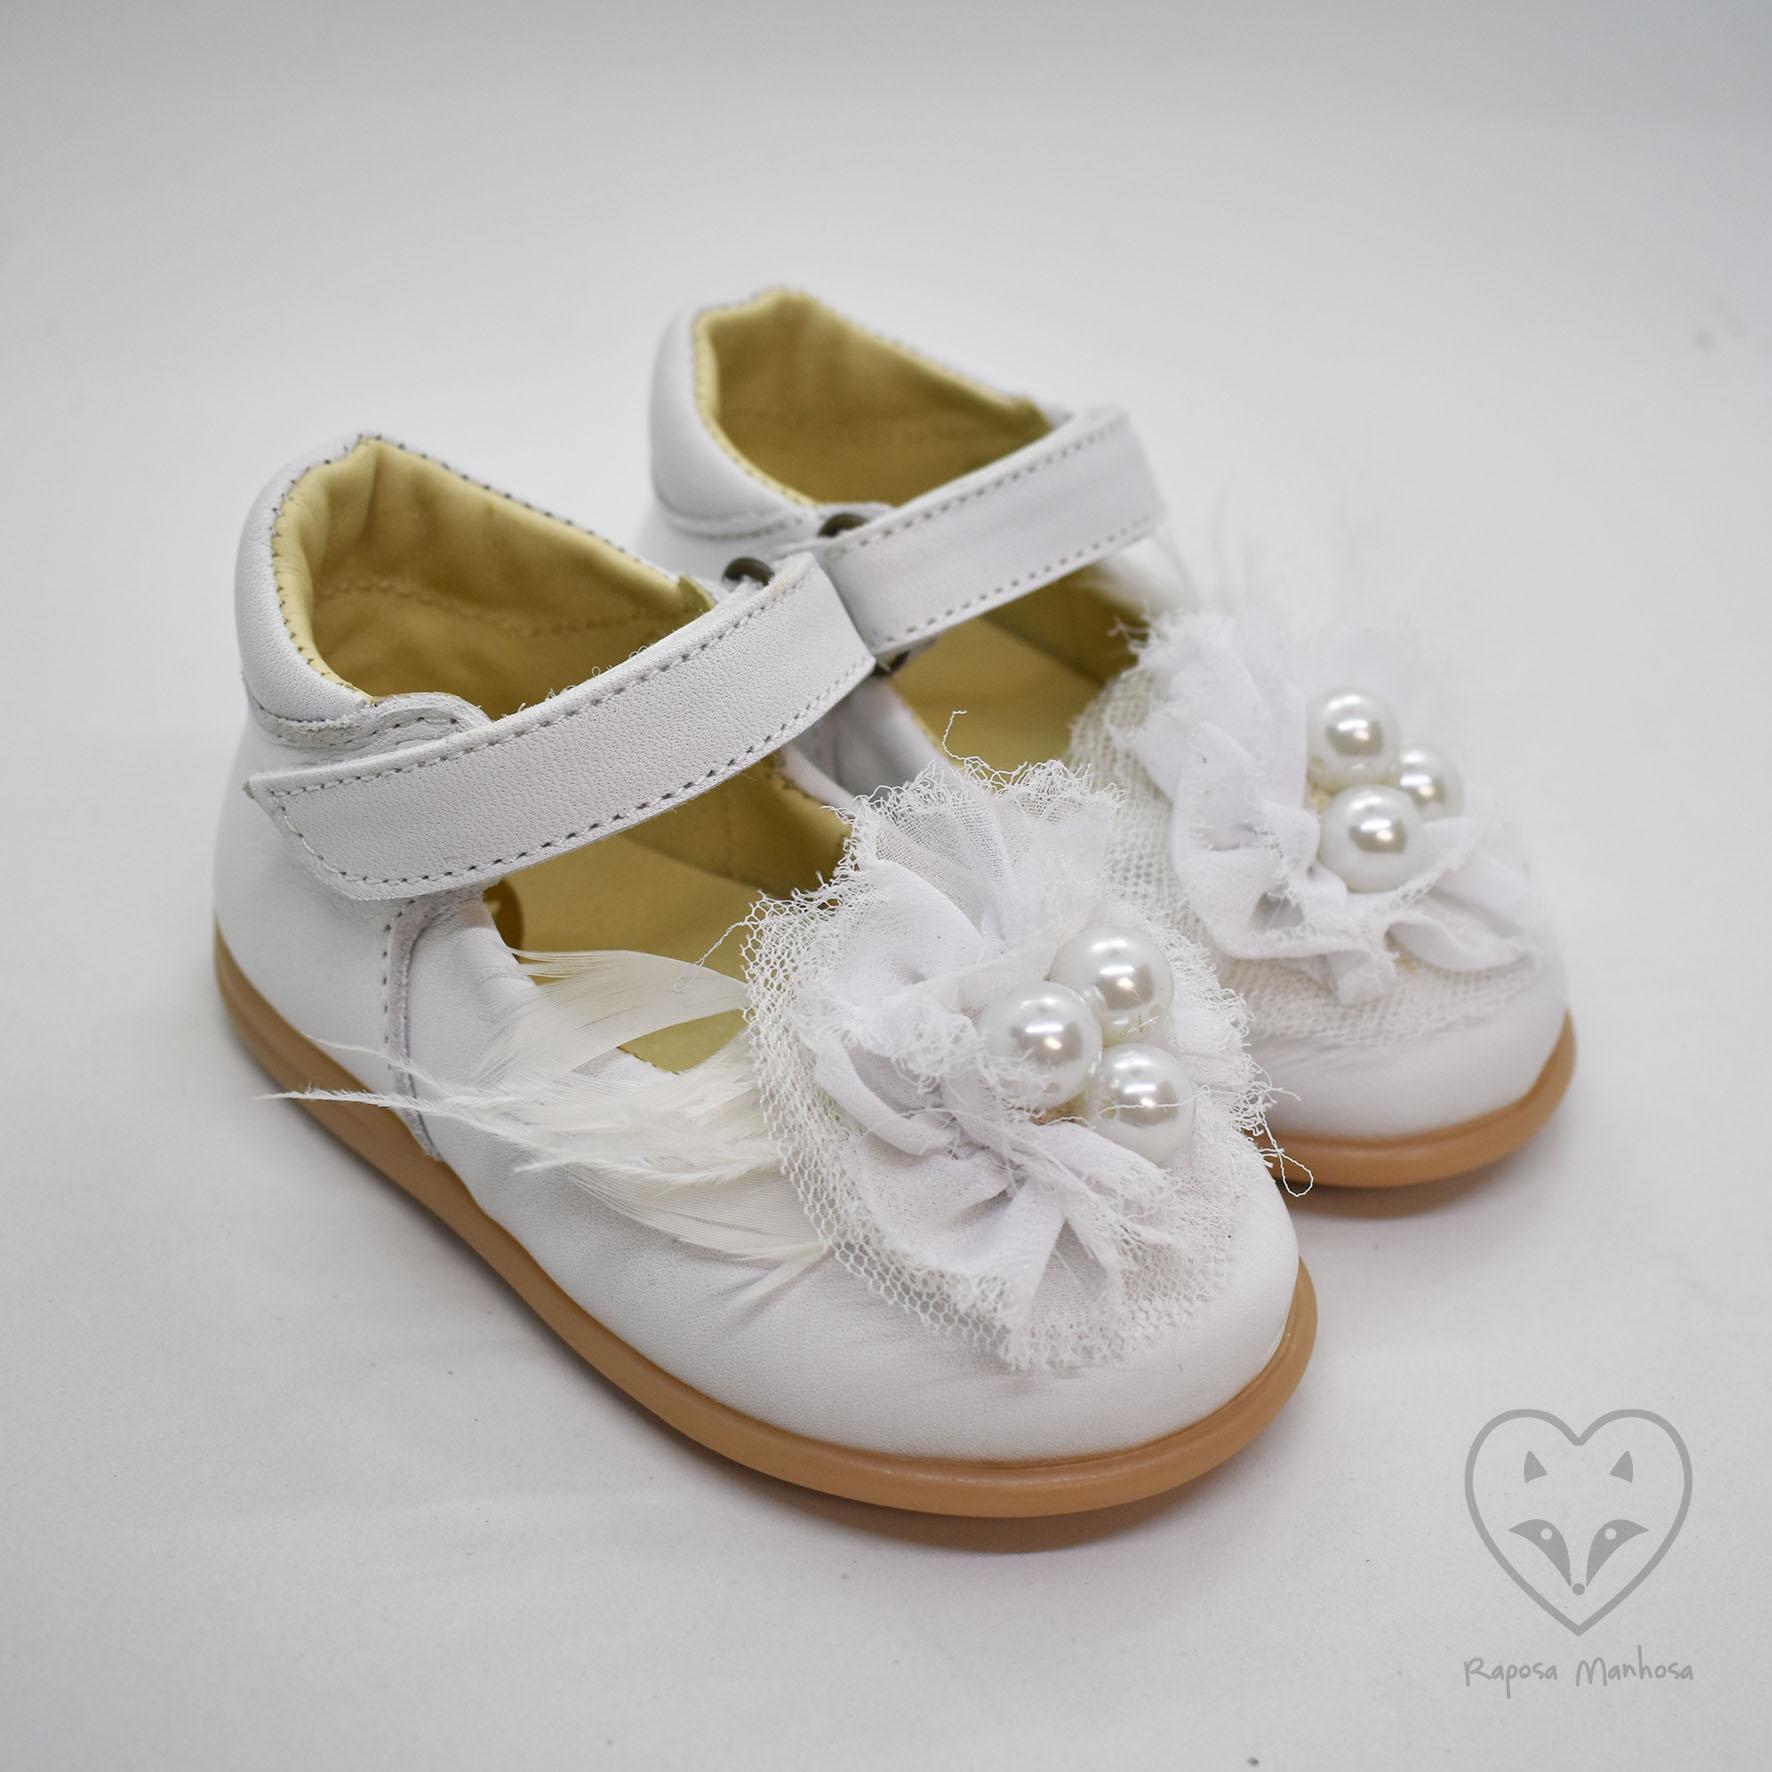 Sapatos Marmelo Flower Stock